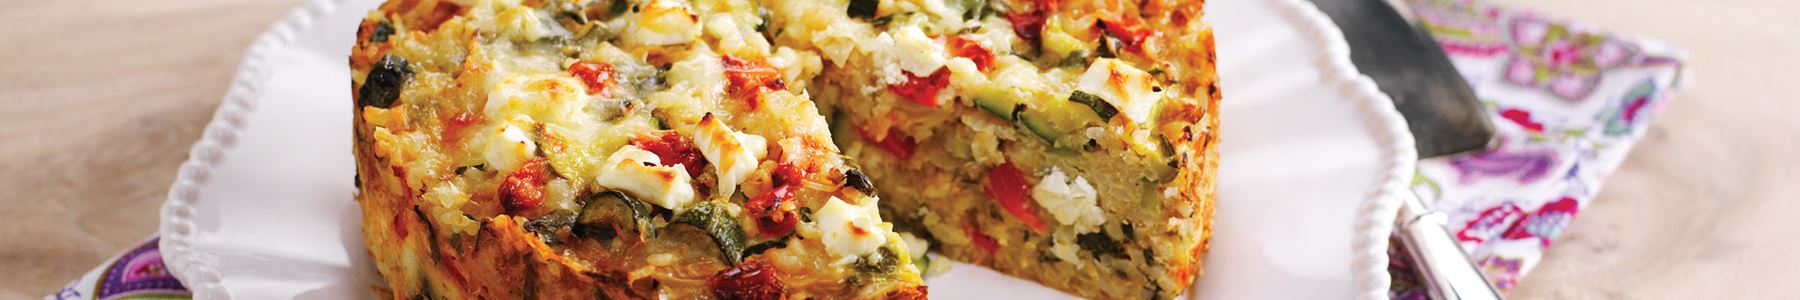 Fänkål + Paprika + Zucchini + Huvudrätt + I ugn